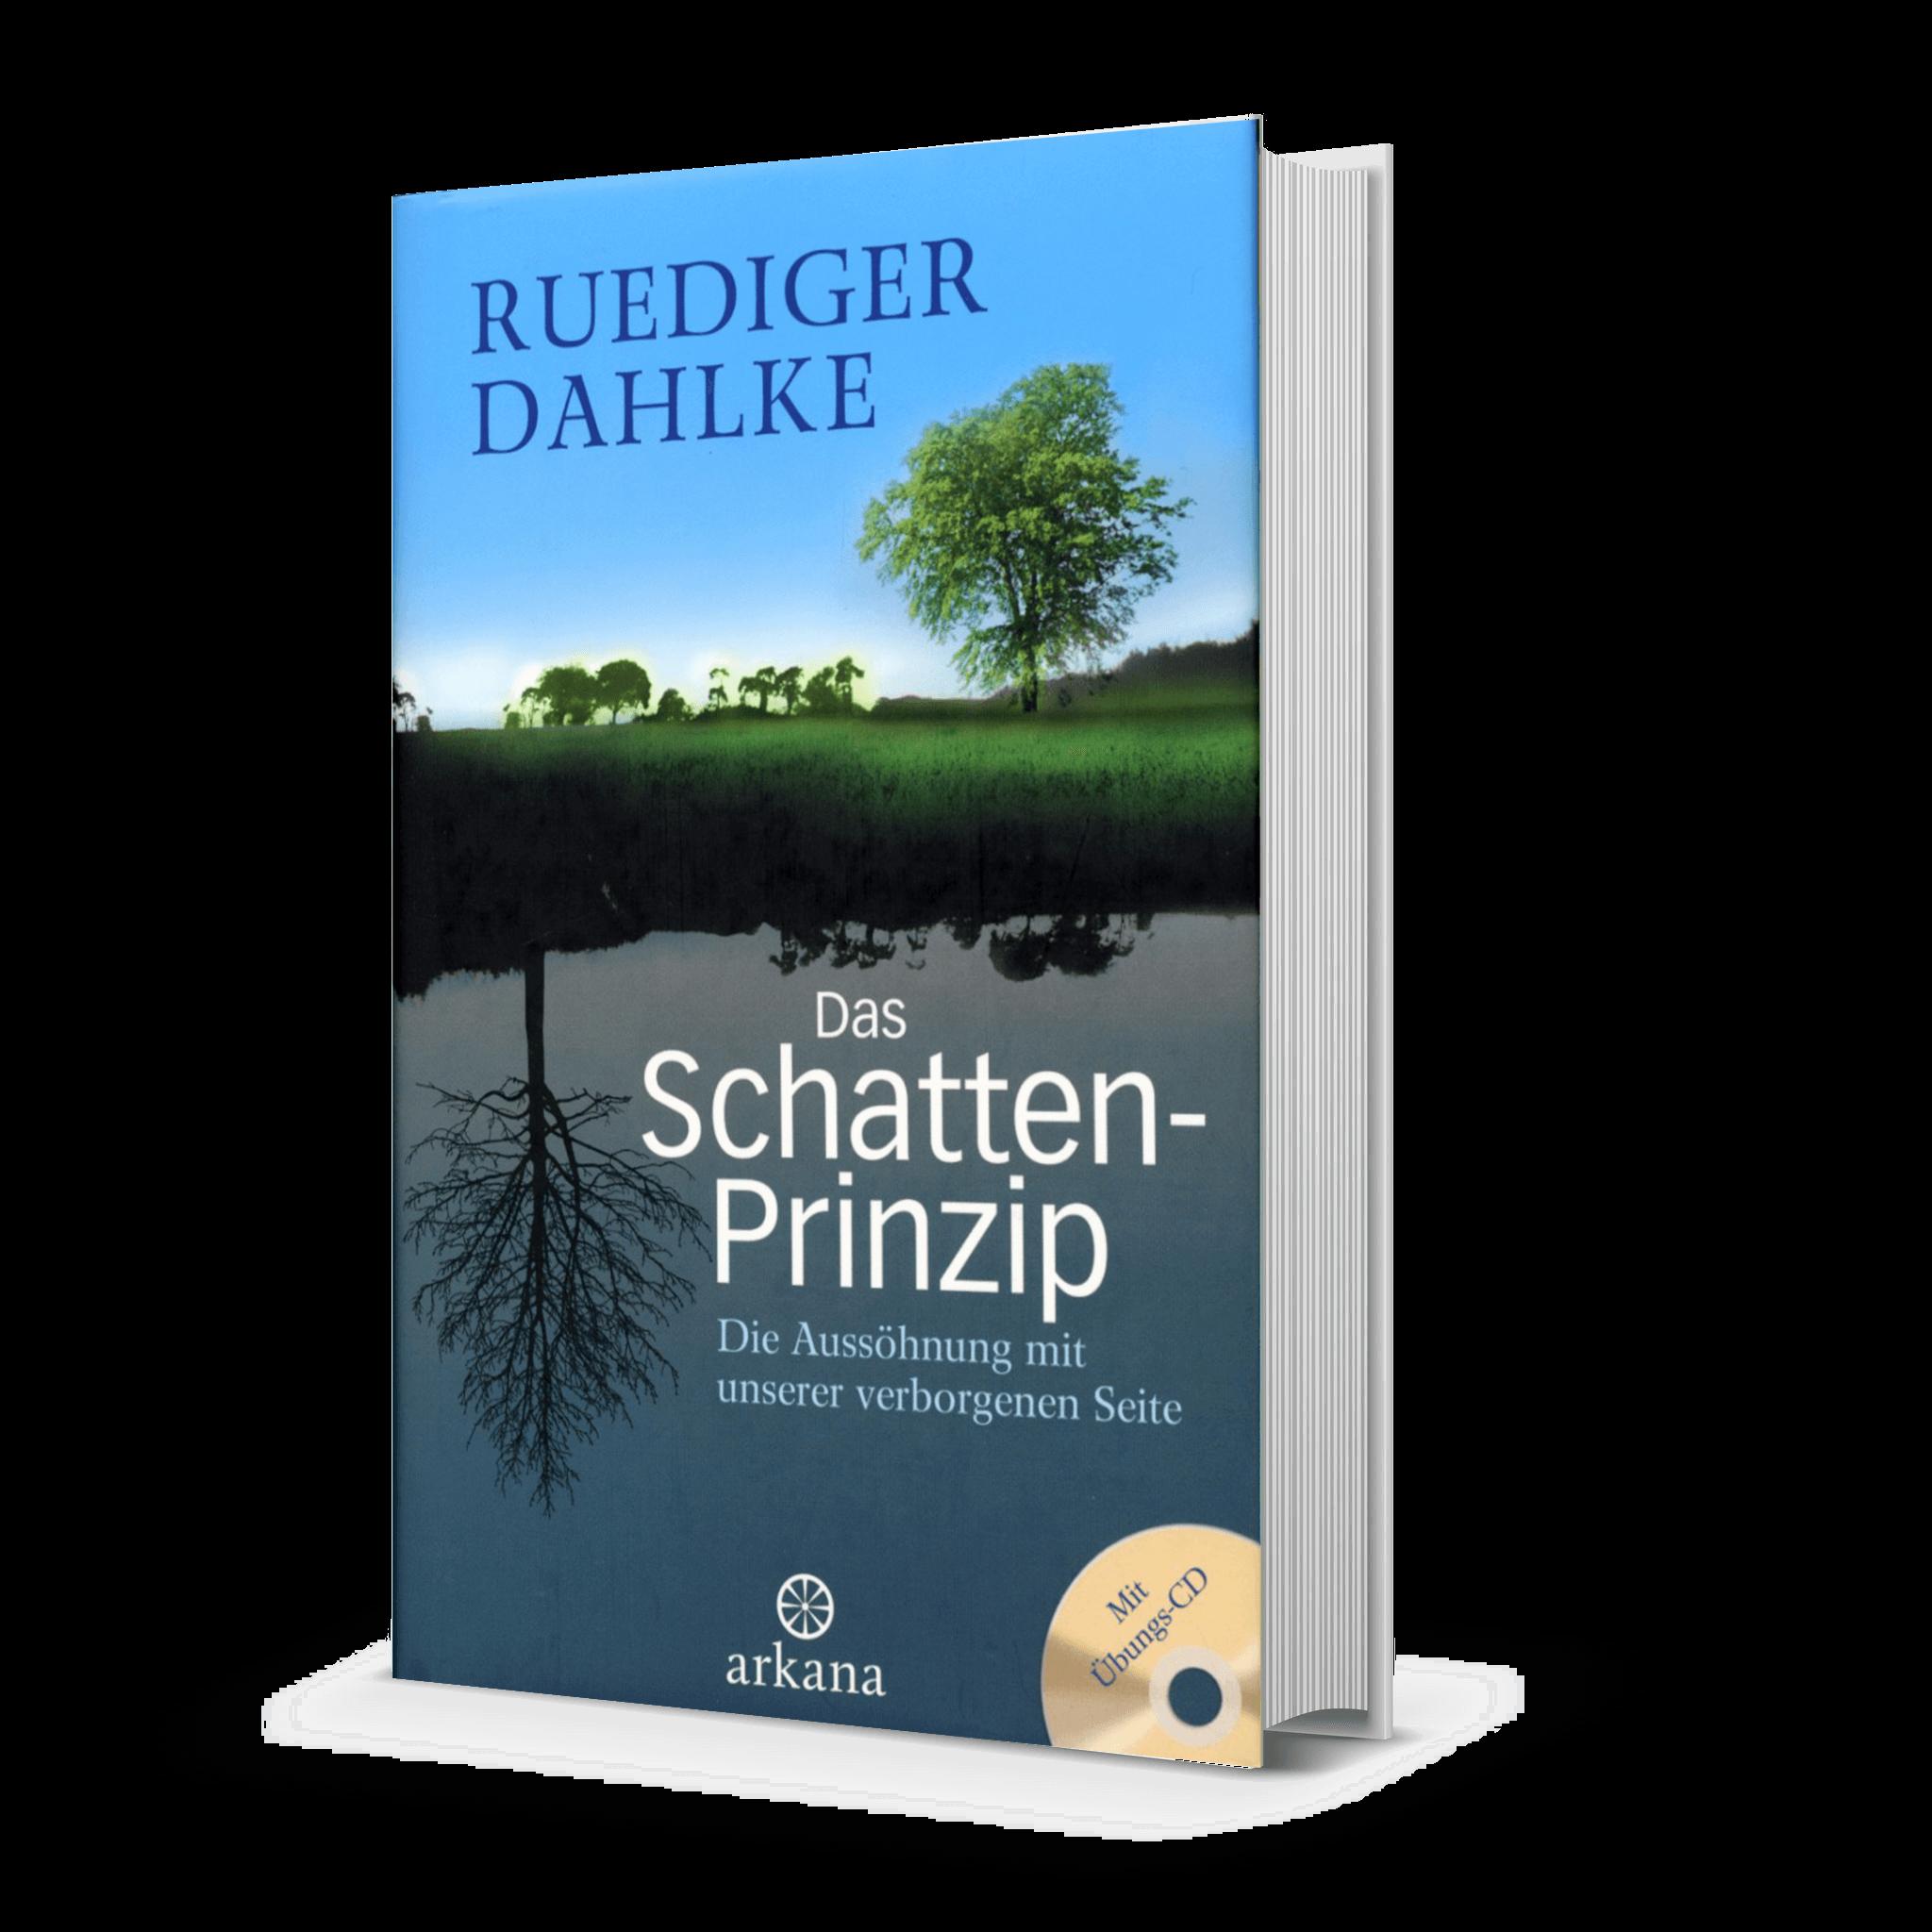 Buch Schattenprinzip Ruediger Dahlke